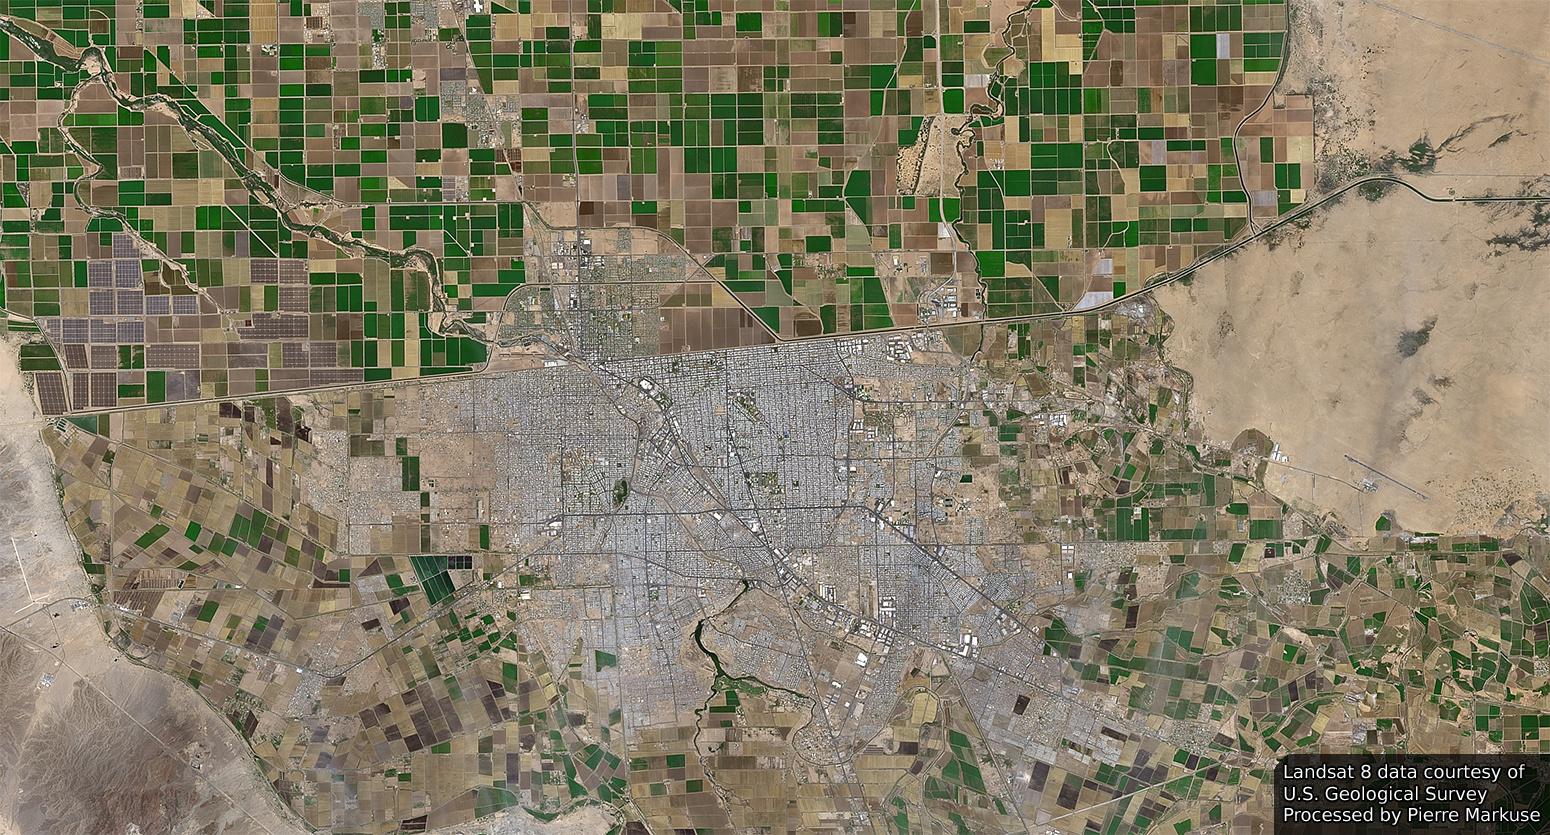 Salton_Sea_432_751enh_pan_crop_focus2_30